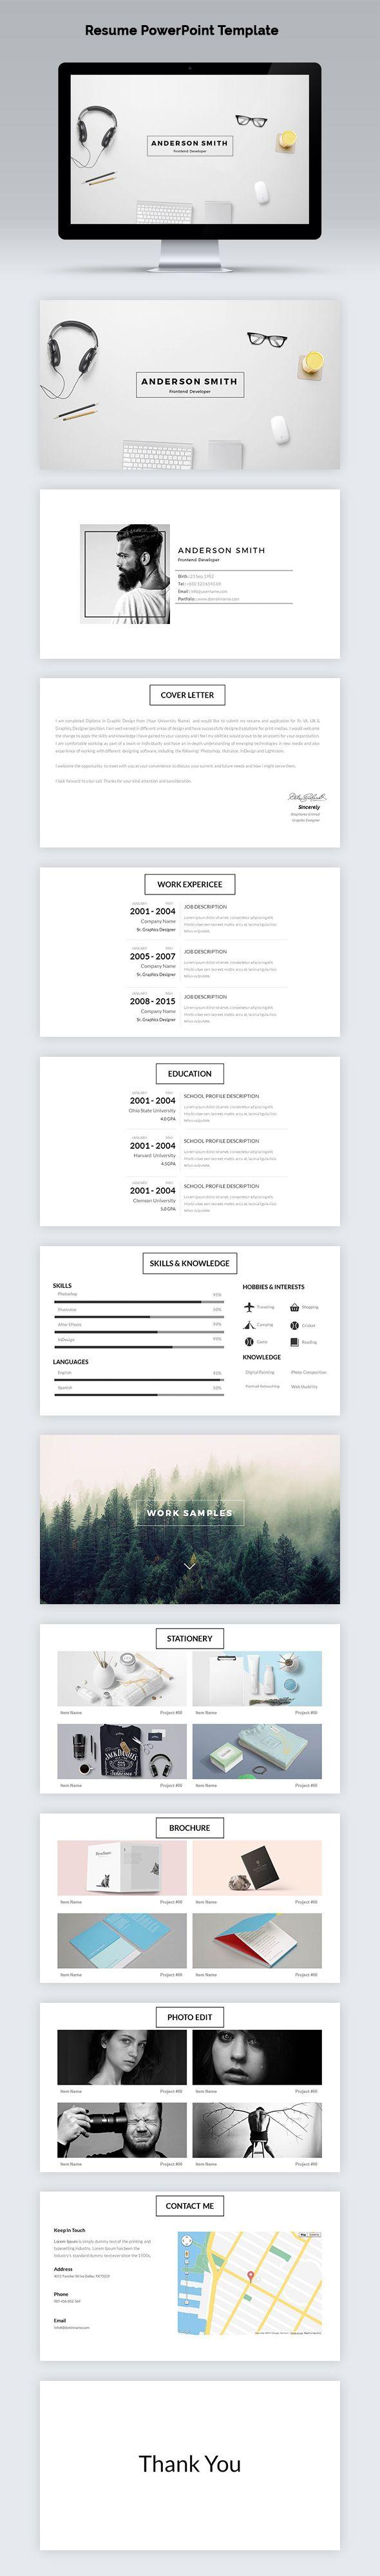 Resume PowerPoint Template - PowerPoint Templates Presentation Templates